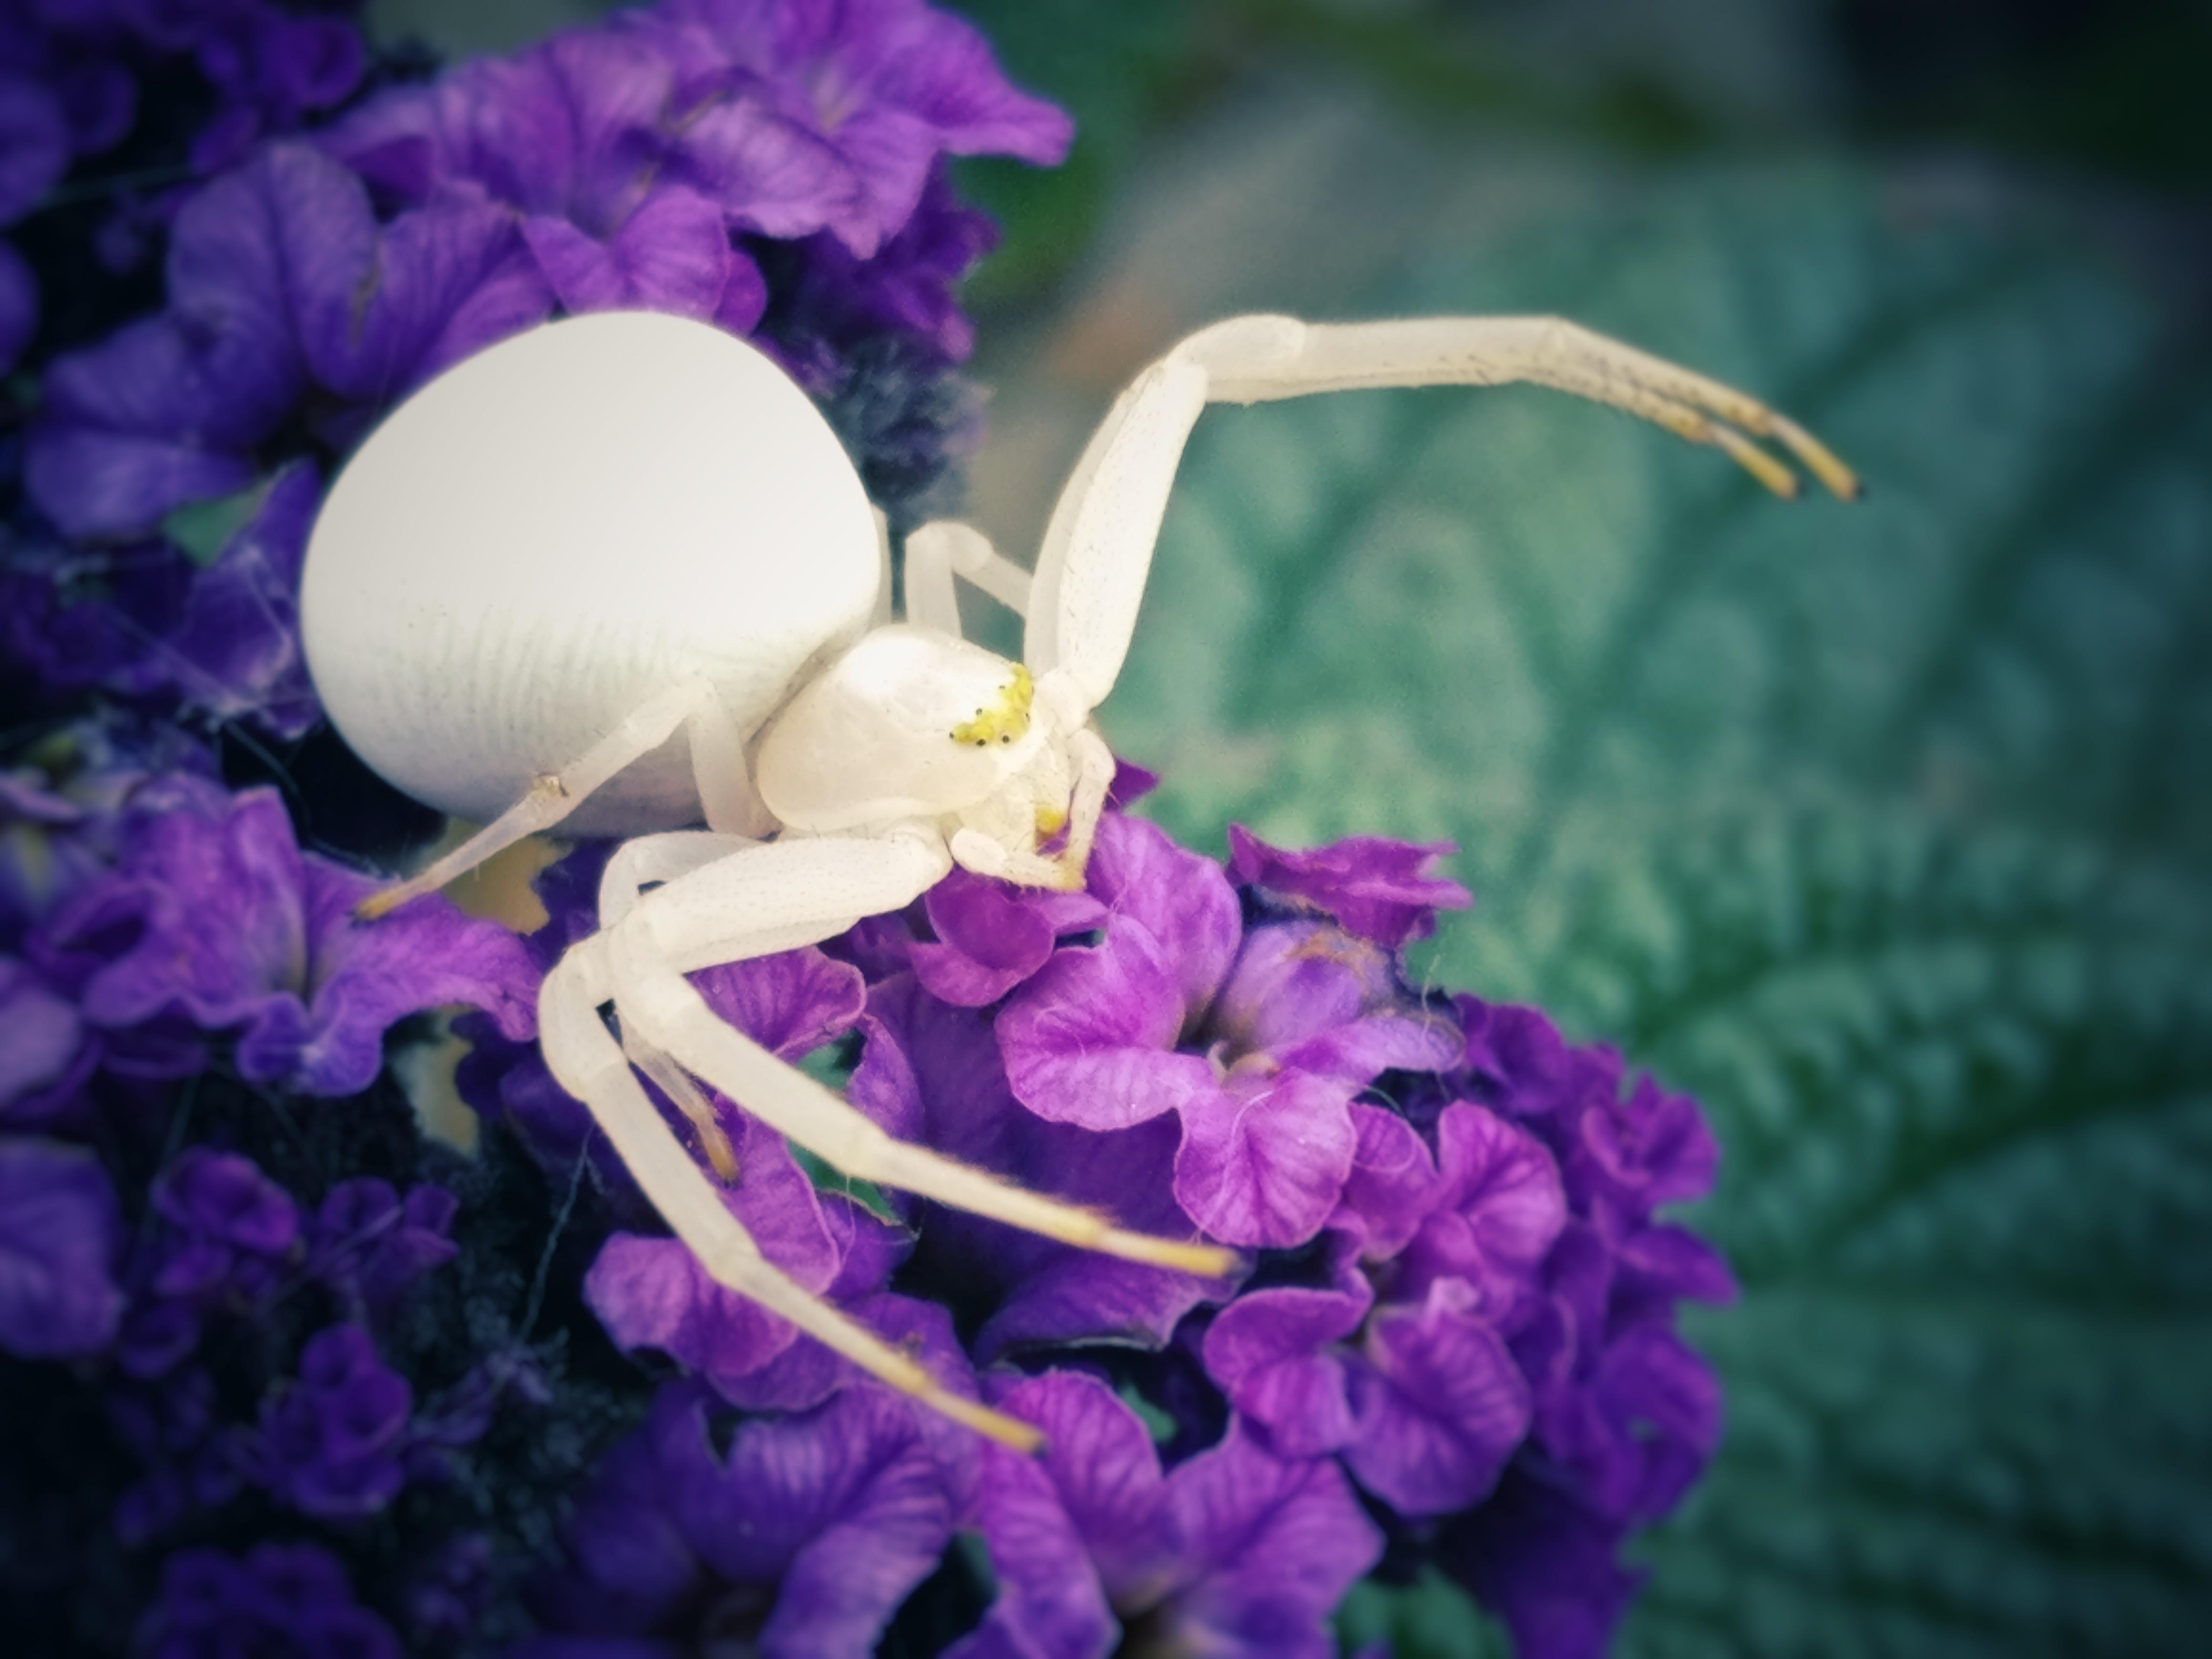 focused photo of white spider on purple flower